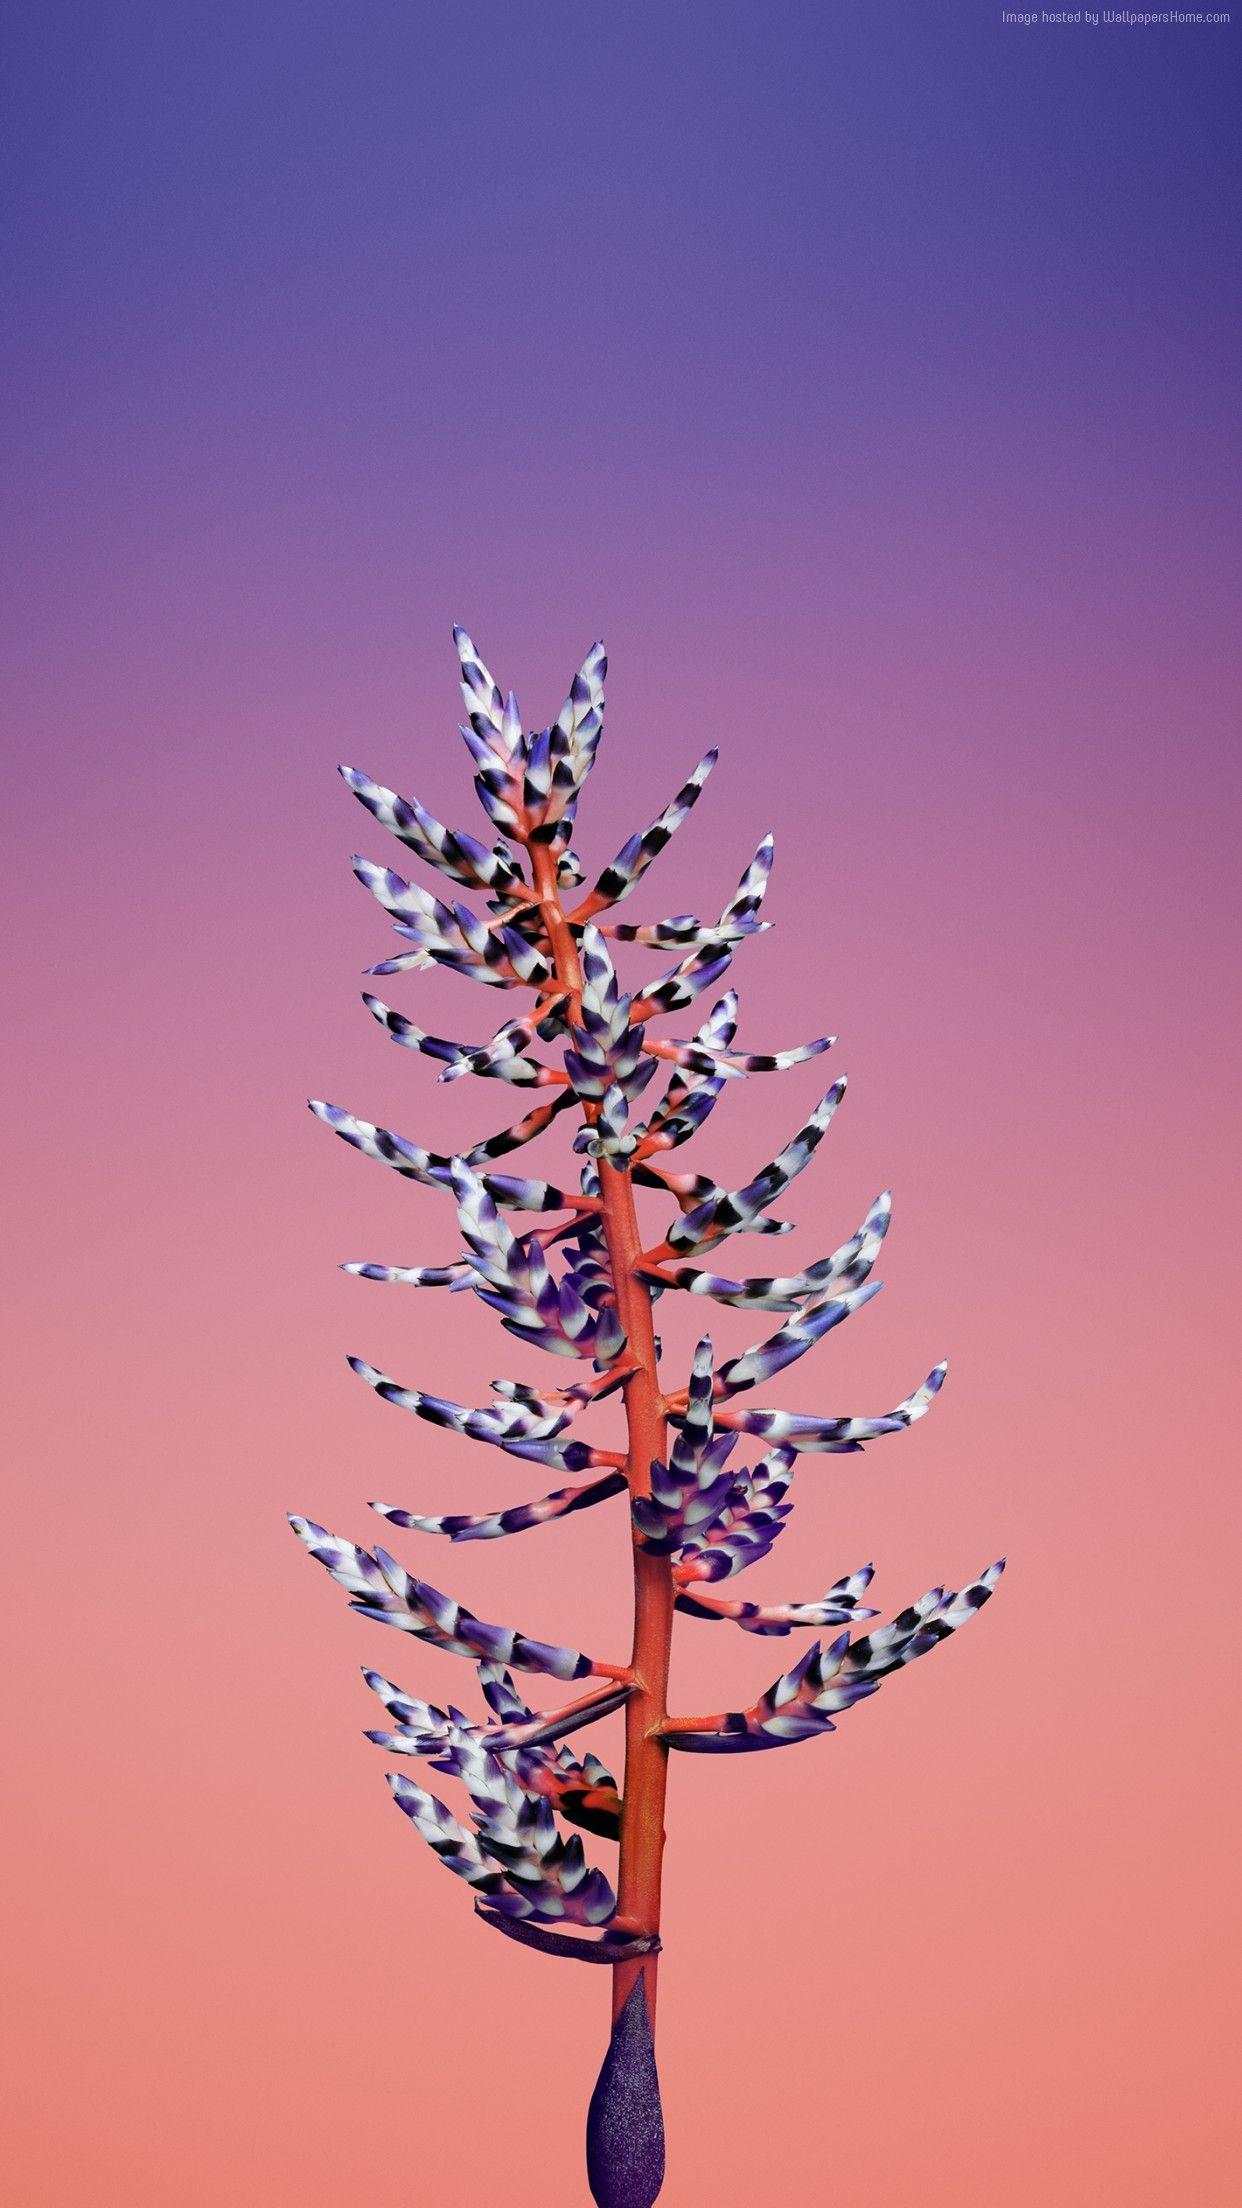 Ios 11 Flower Blue Abstract Apple Wallpaper Iphone X Iphone 8 Clean Beauty Colour Ios Minimal Iphone 7 Iphone 6 Seni Bunga